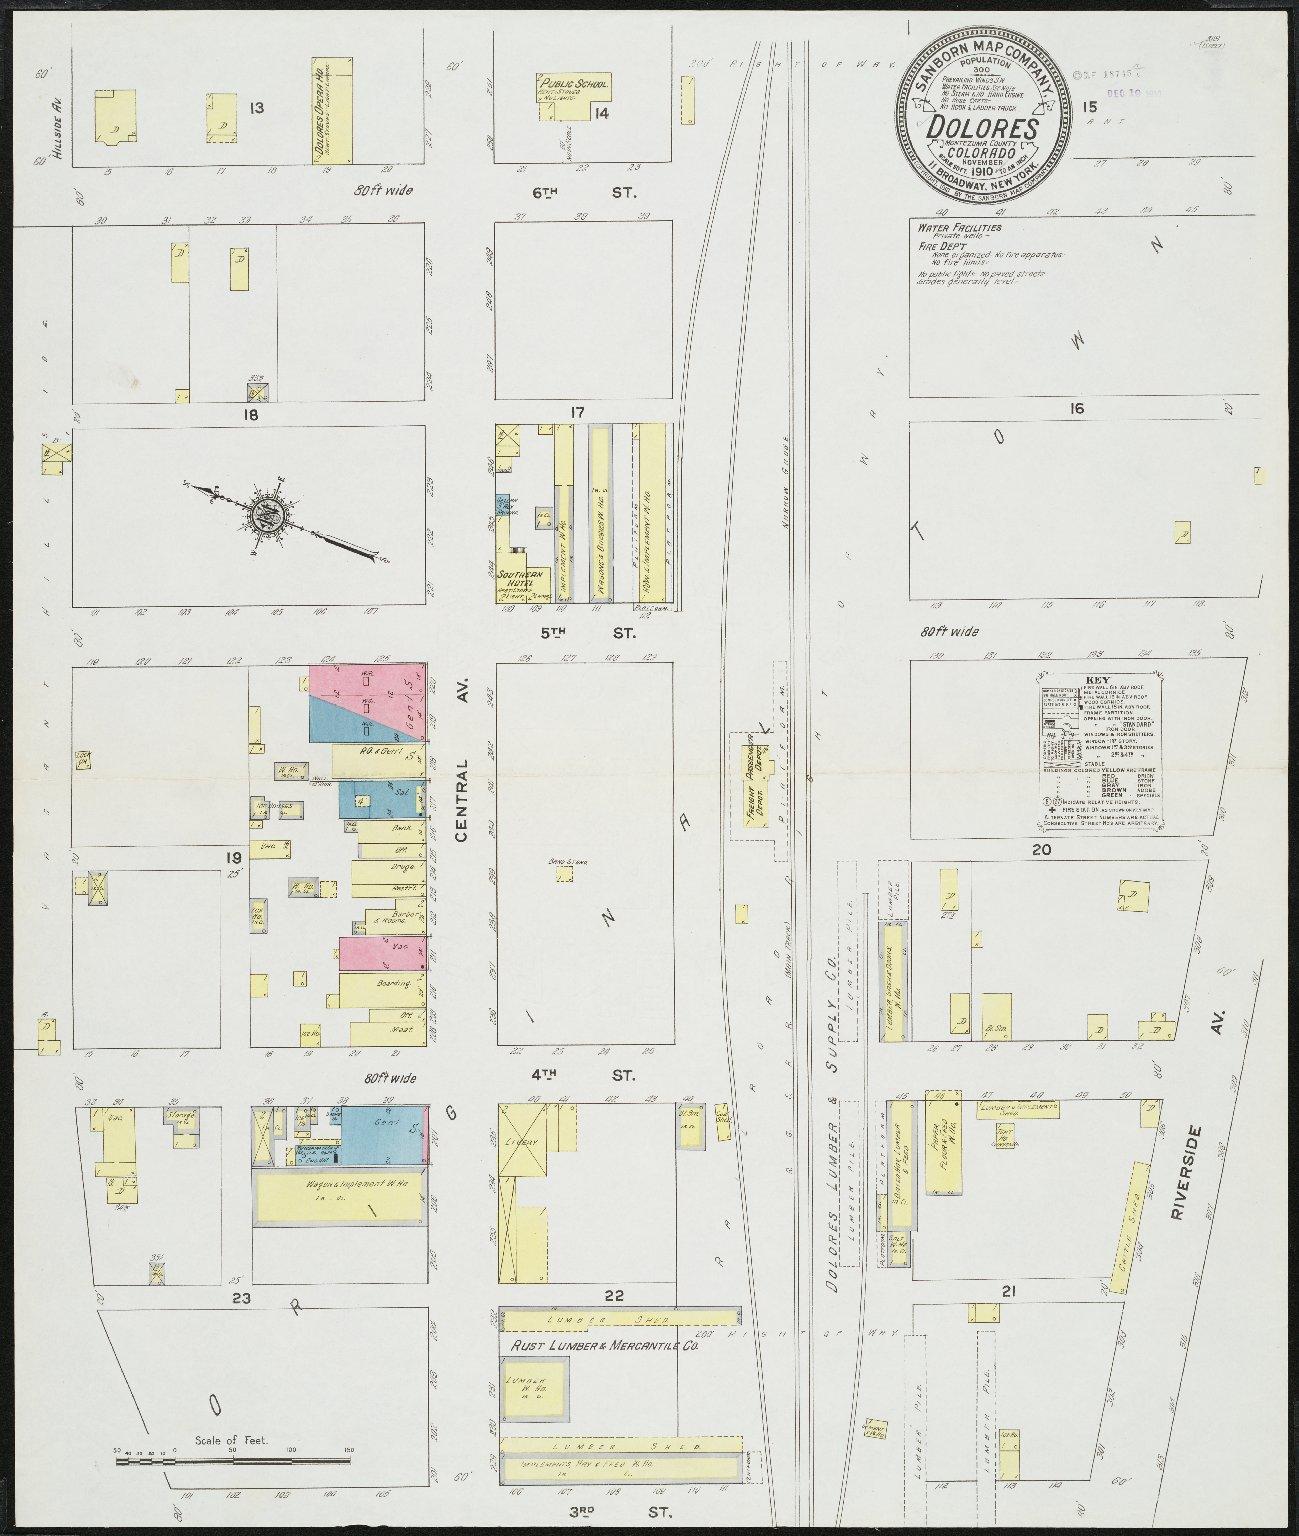 Dolores Montezuma County Colorado Sanborn Fire Insurance Map